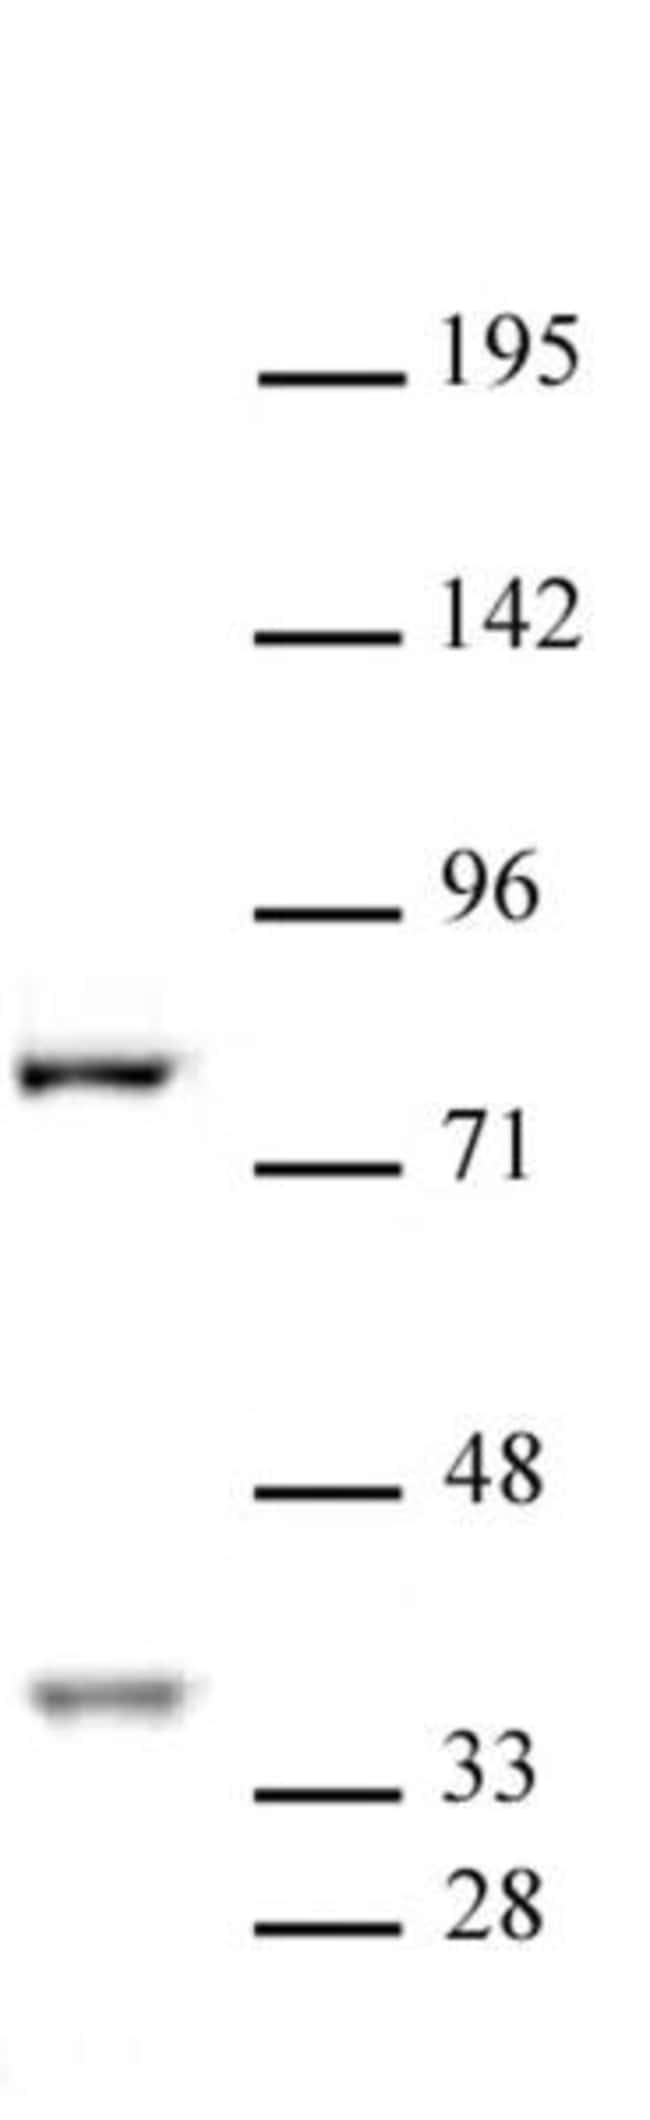 CENP-B Rabbit anti-Human, Unconjugated, Polyclonal, Active Motif:Antibodies:Primary